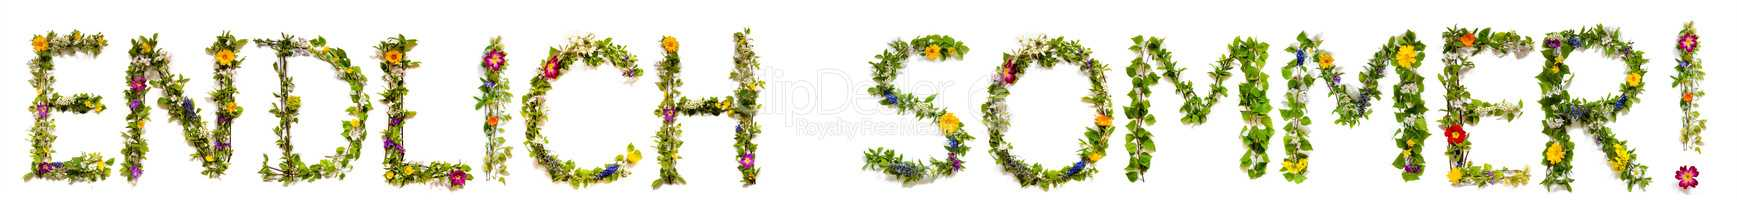 Flower And Blossom Letter Building Word Endlisch Sommer Means Finally Summer